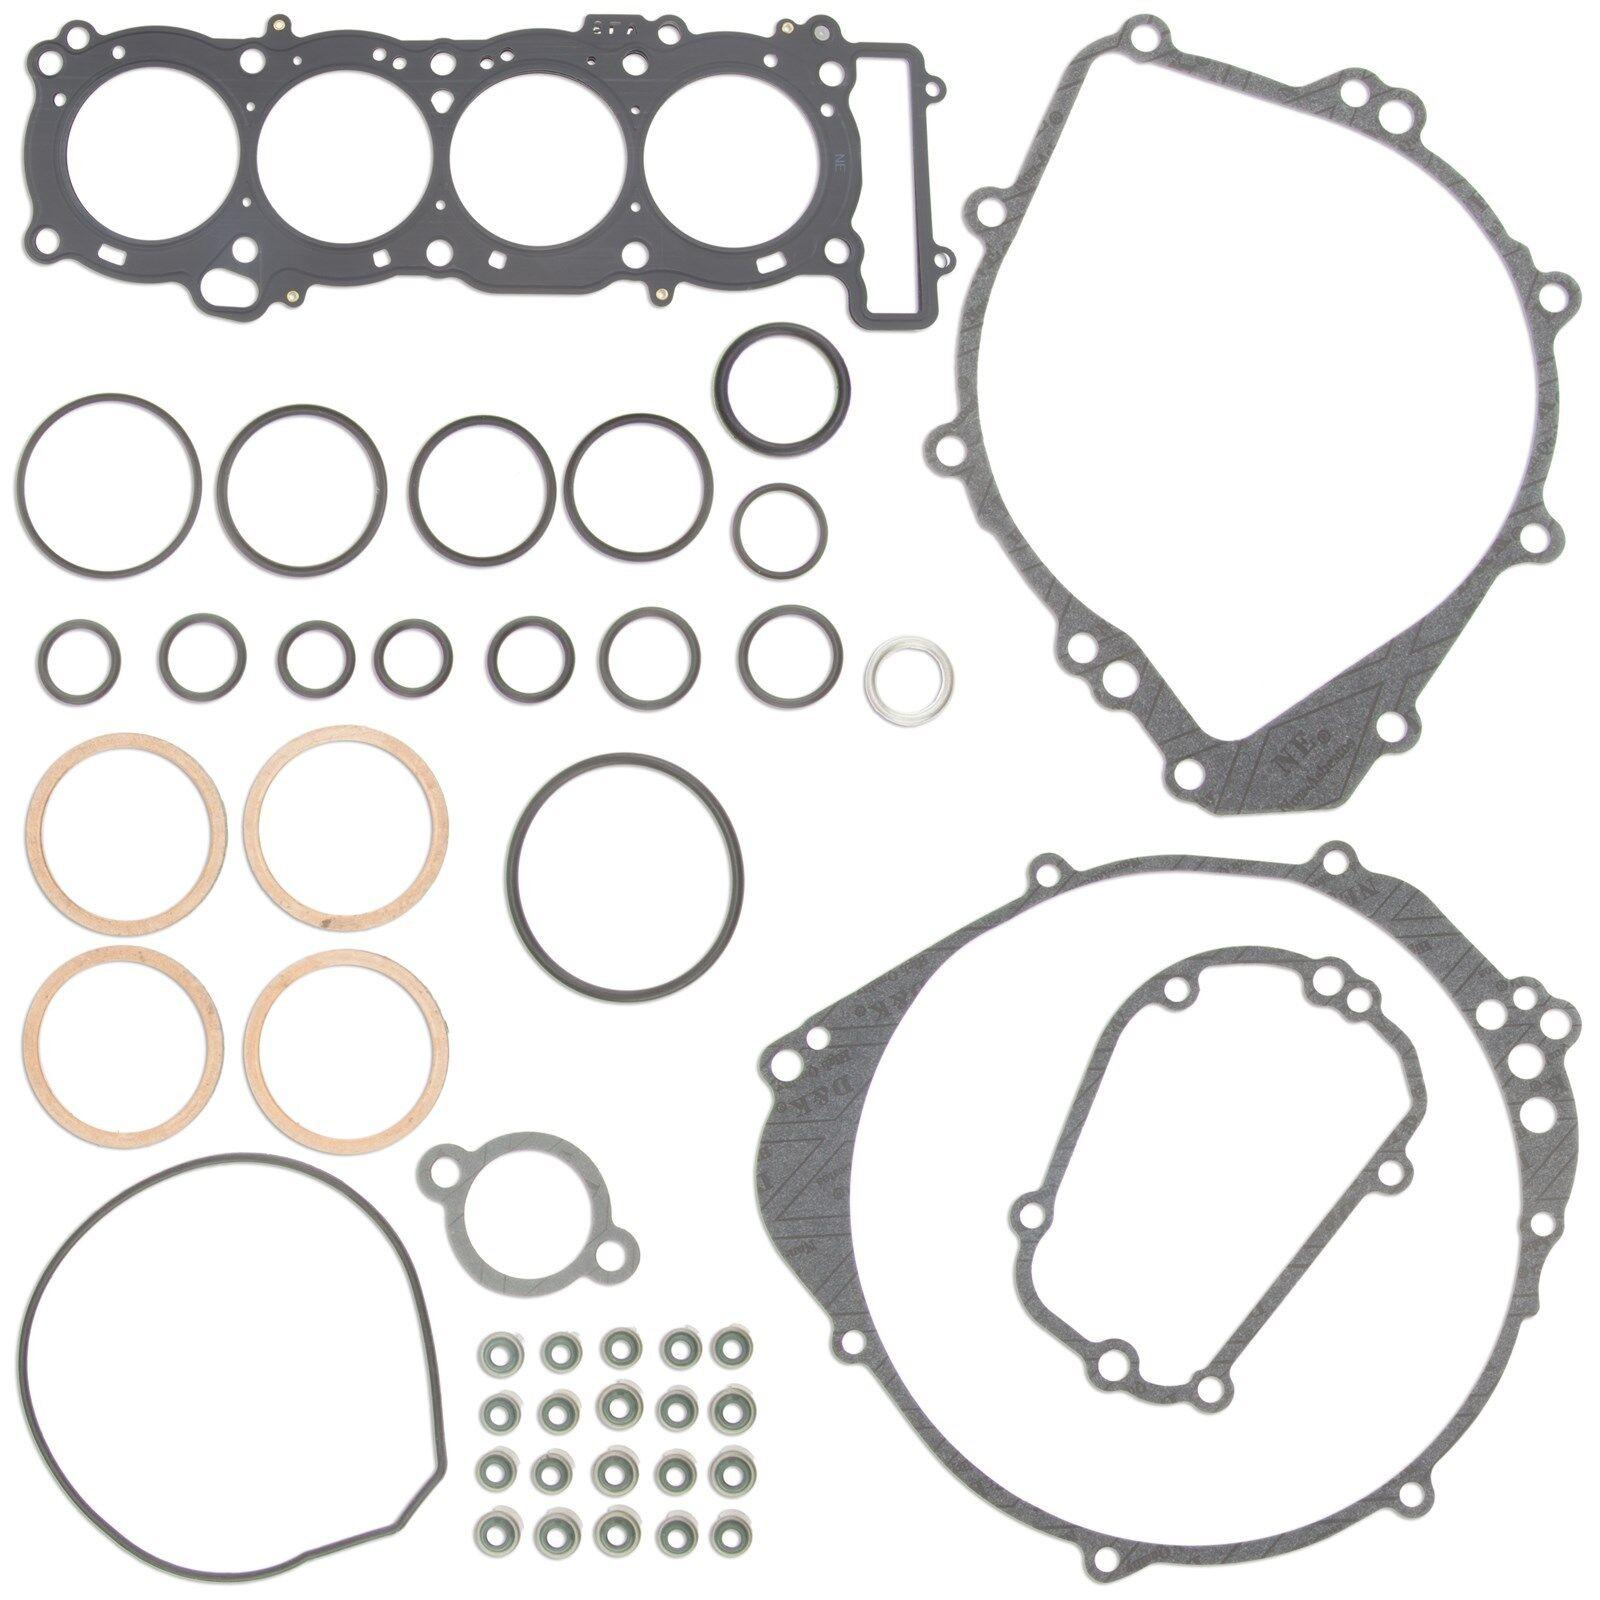 Engine Gasket Rebuild Kit Set Yamaha Fz1 Fzs Fazer Top End 05 04 03 02 01